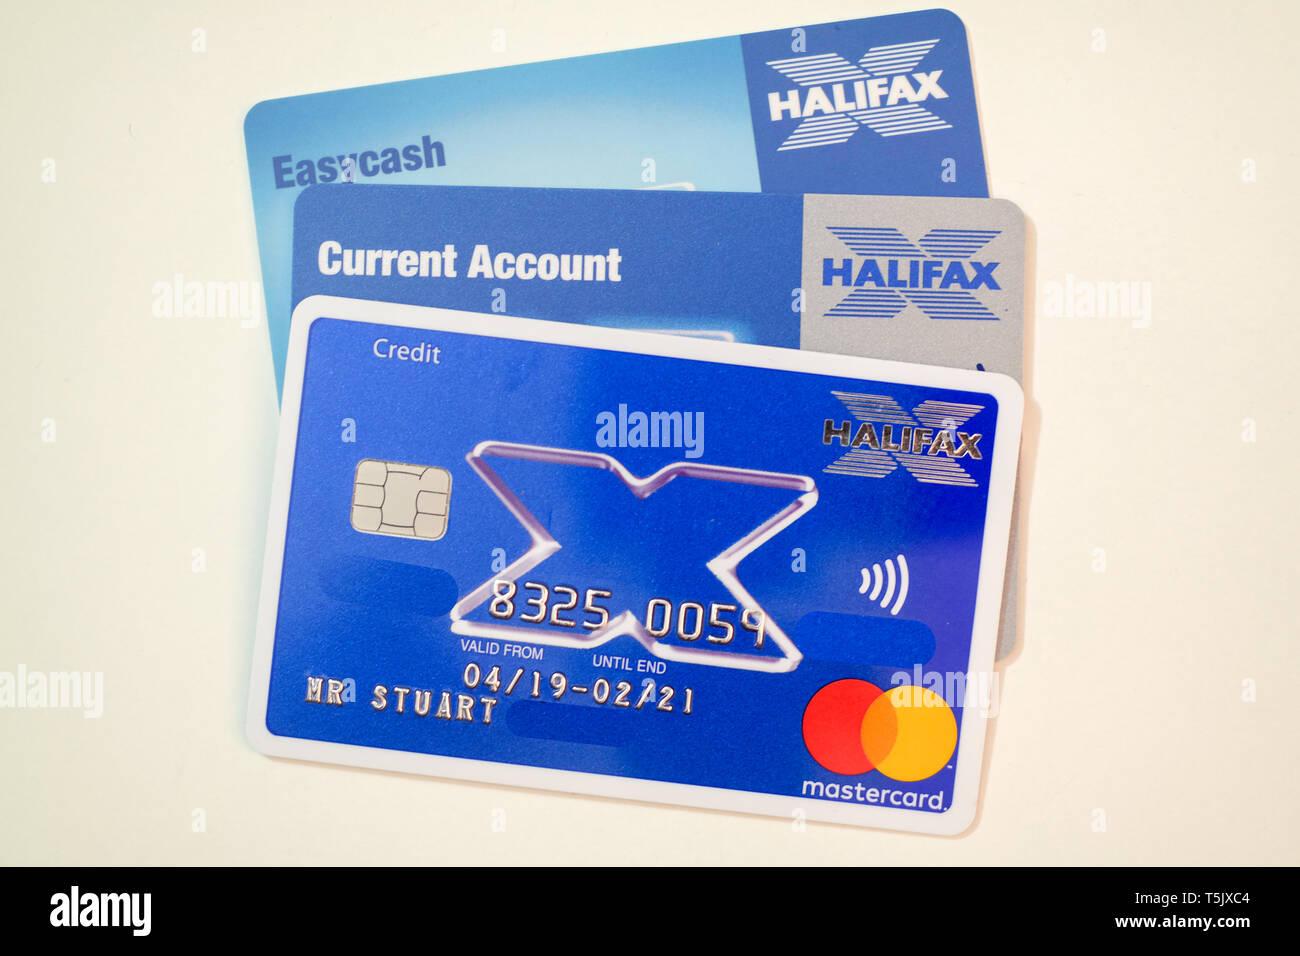 Halifax Bank Cards Stock Photo Alamy